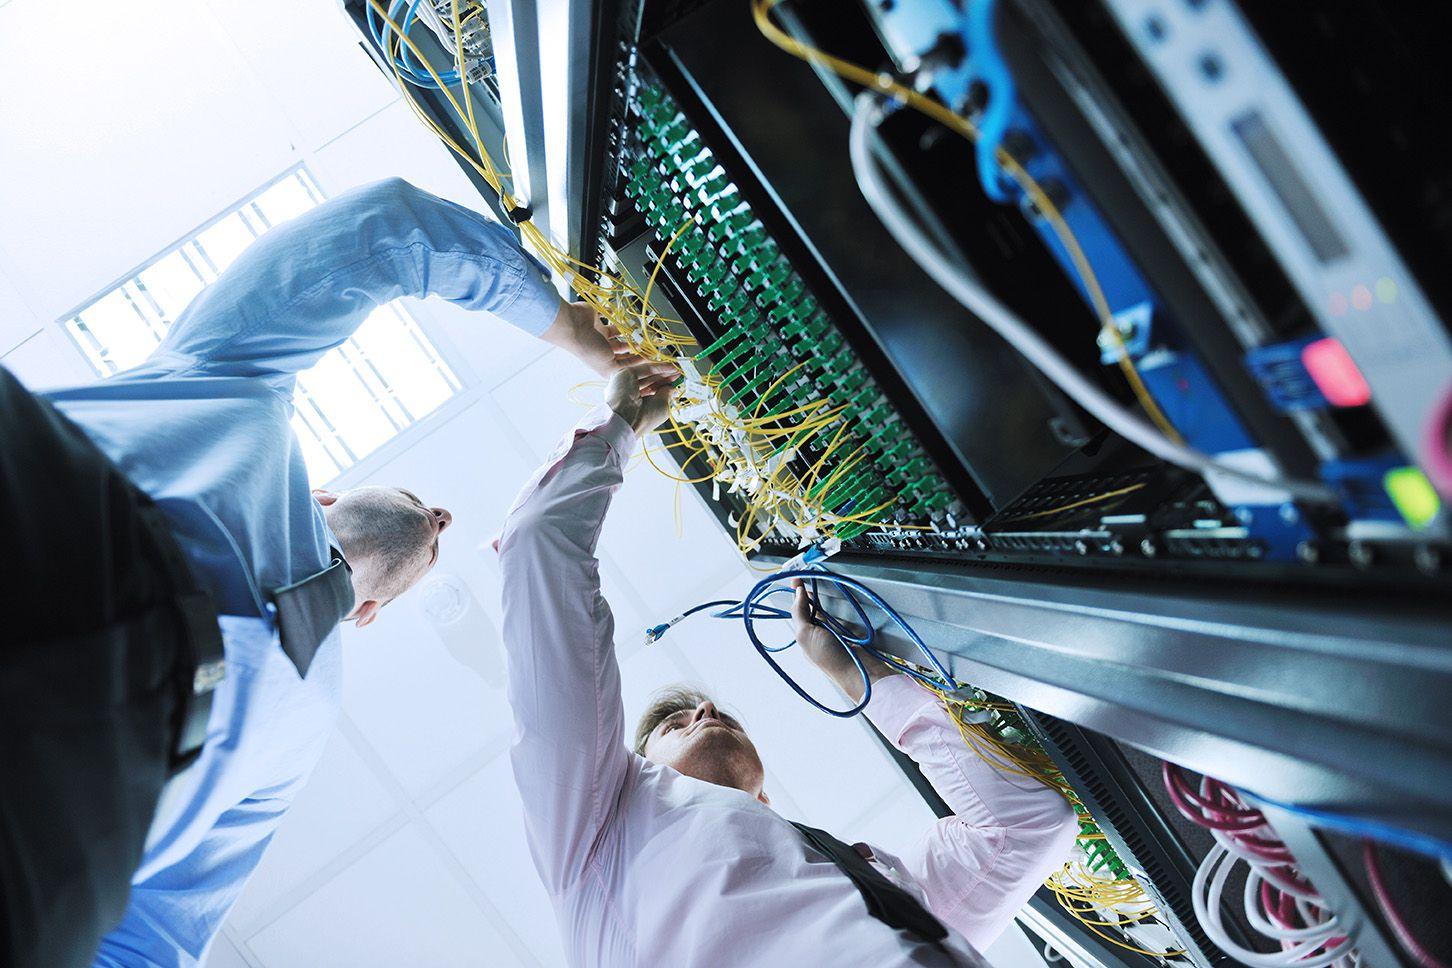 Automation Seems to Worsen Present IT Skills Shortage